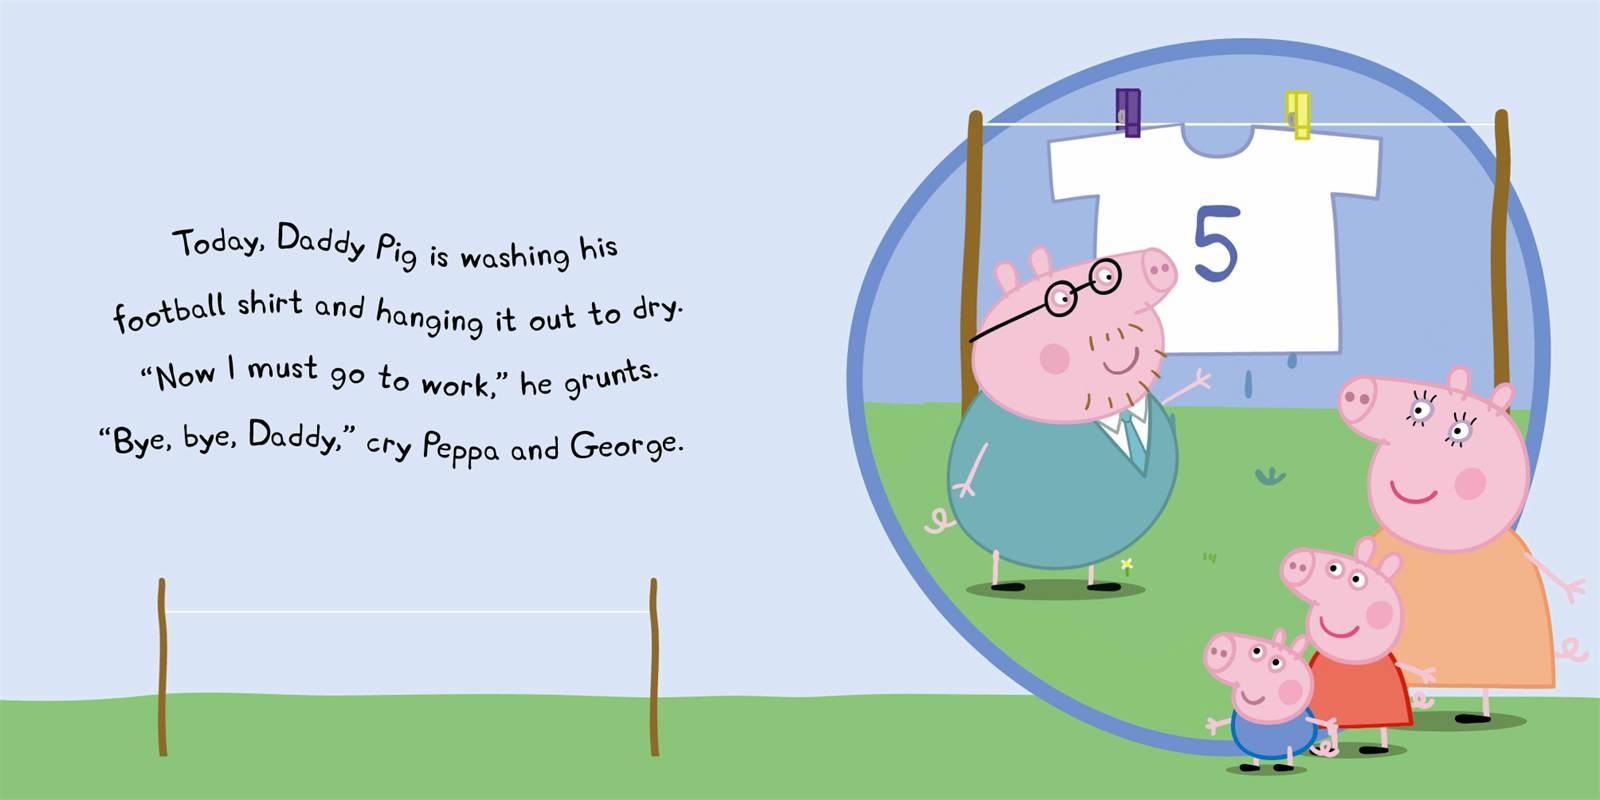 Peppa Pig - Immagini varie